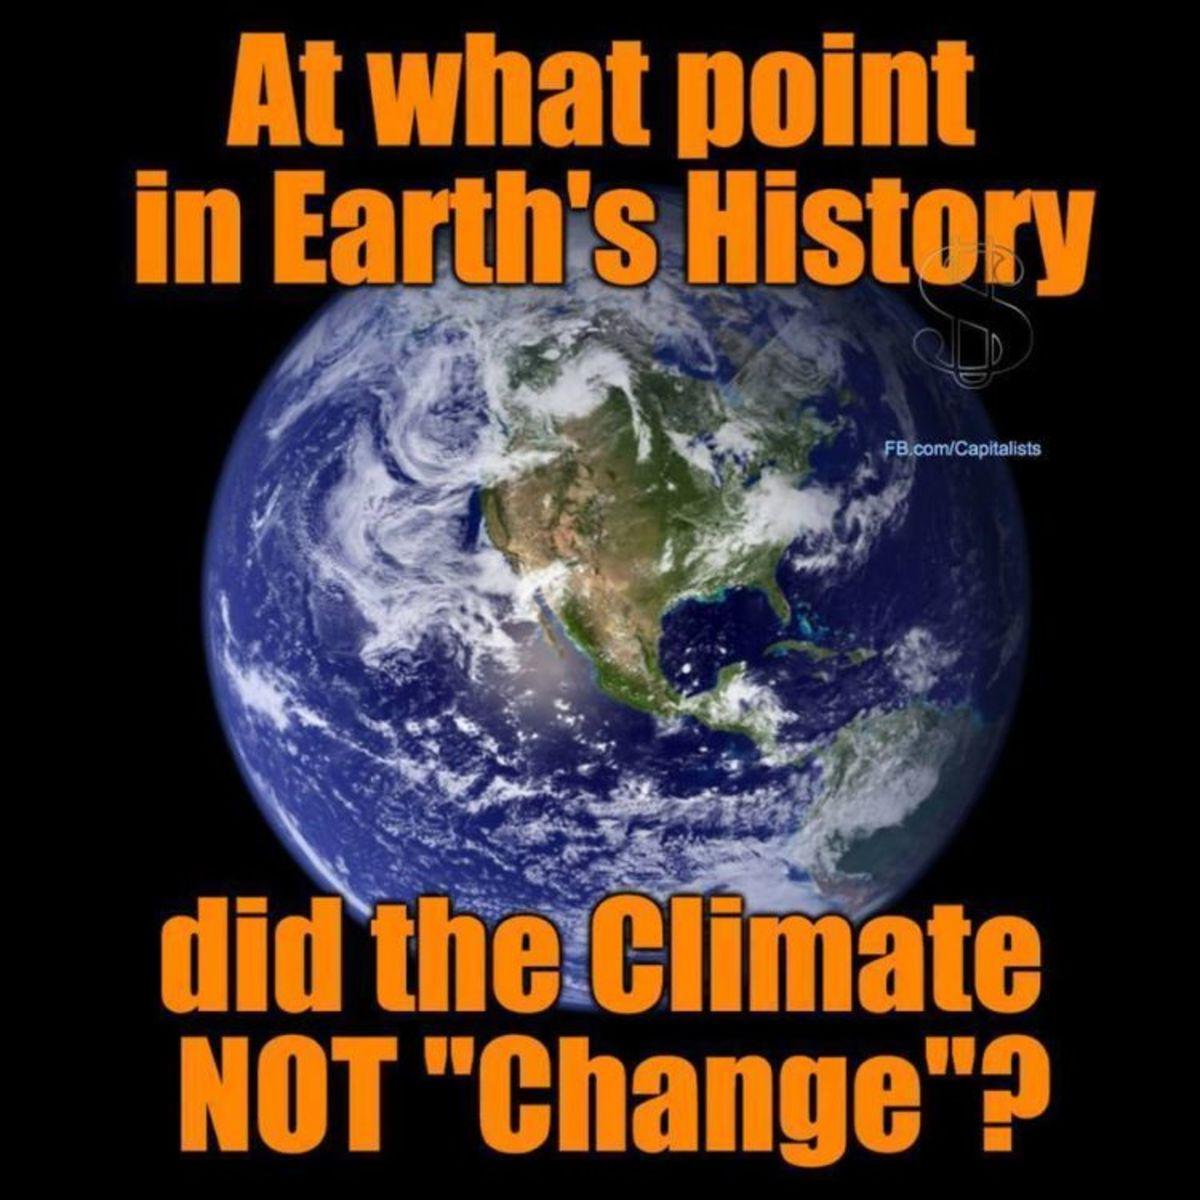 global-warming-myth-climate-change-hoax